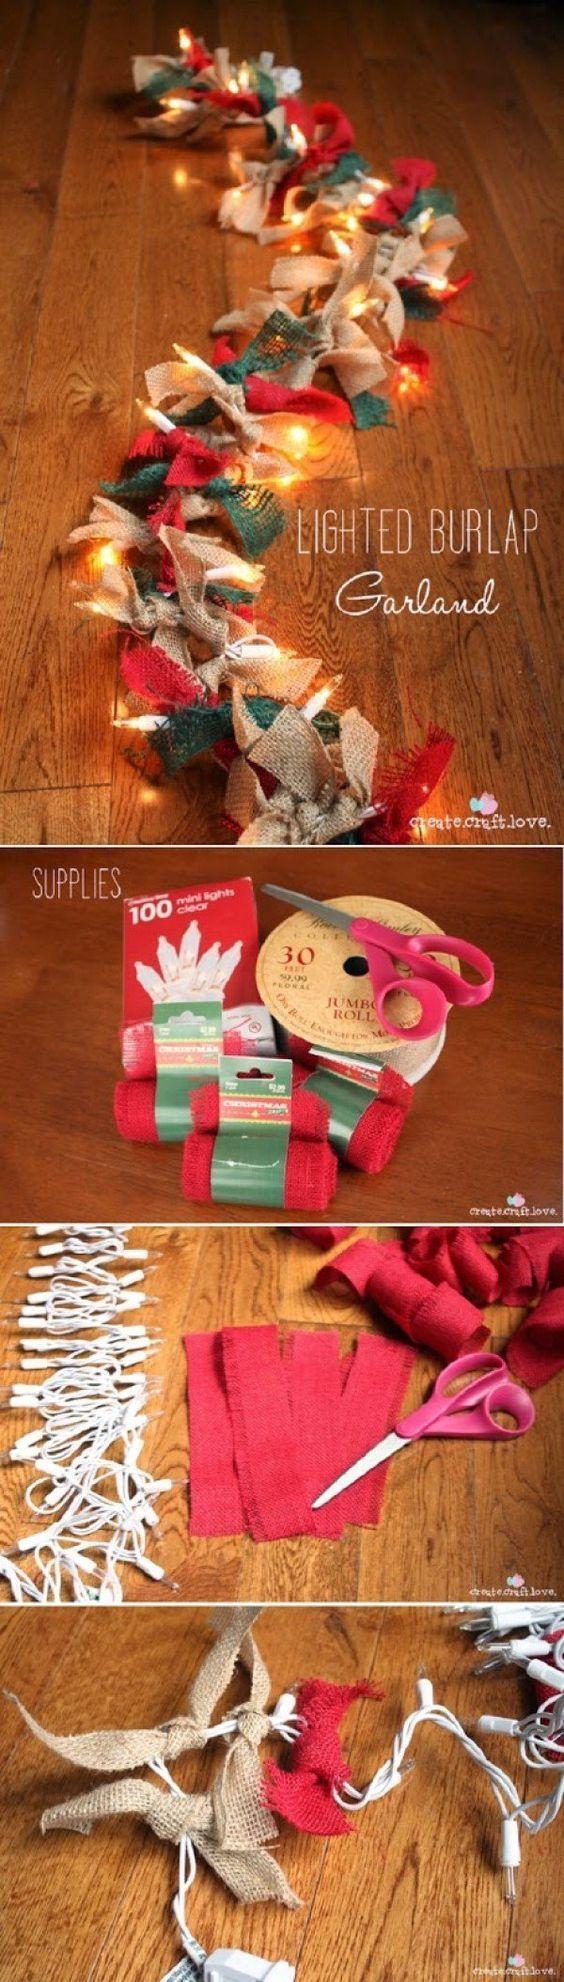 17 Creative and Stylish DIY for Christmas lights: 13. Lighted Burlap Garland - Diy & Crafts Ideas Magazine #christmaslightsdiy